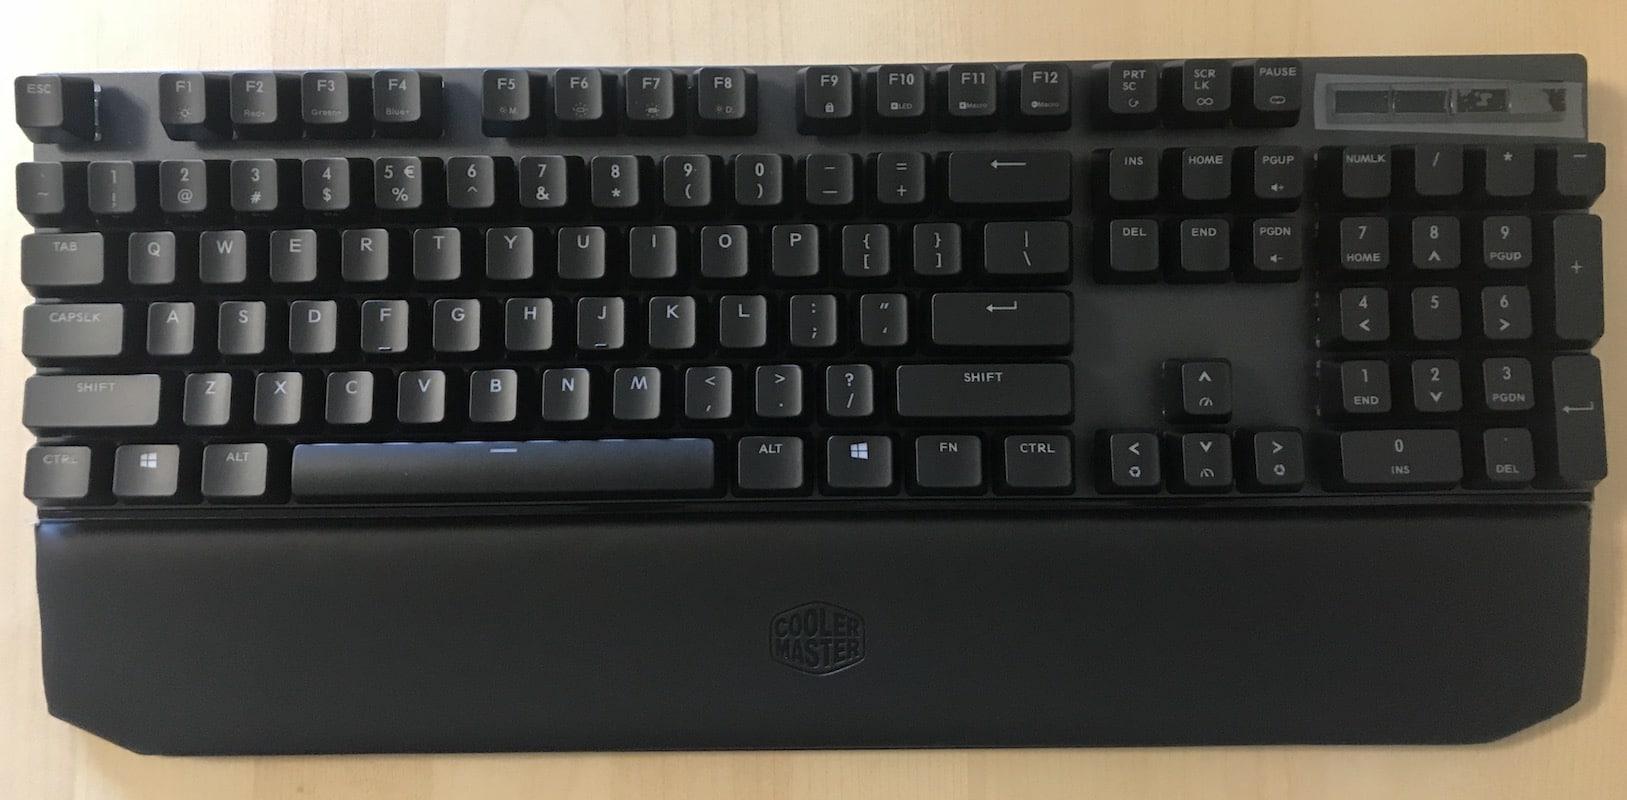 Cooler Master MasterKeys MK750 Mechanical Keyboard Review 4